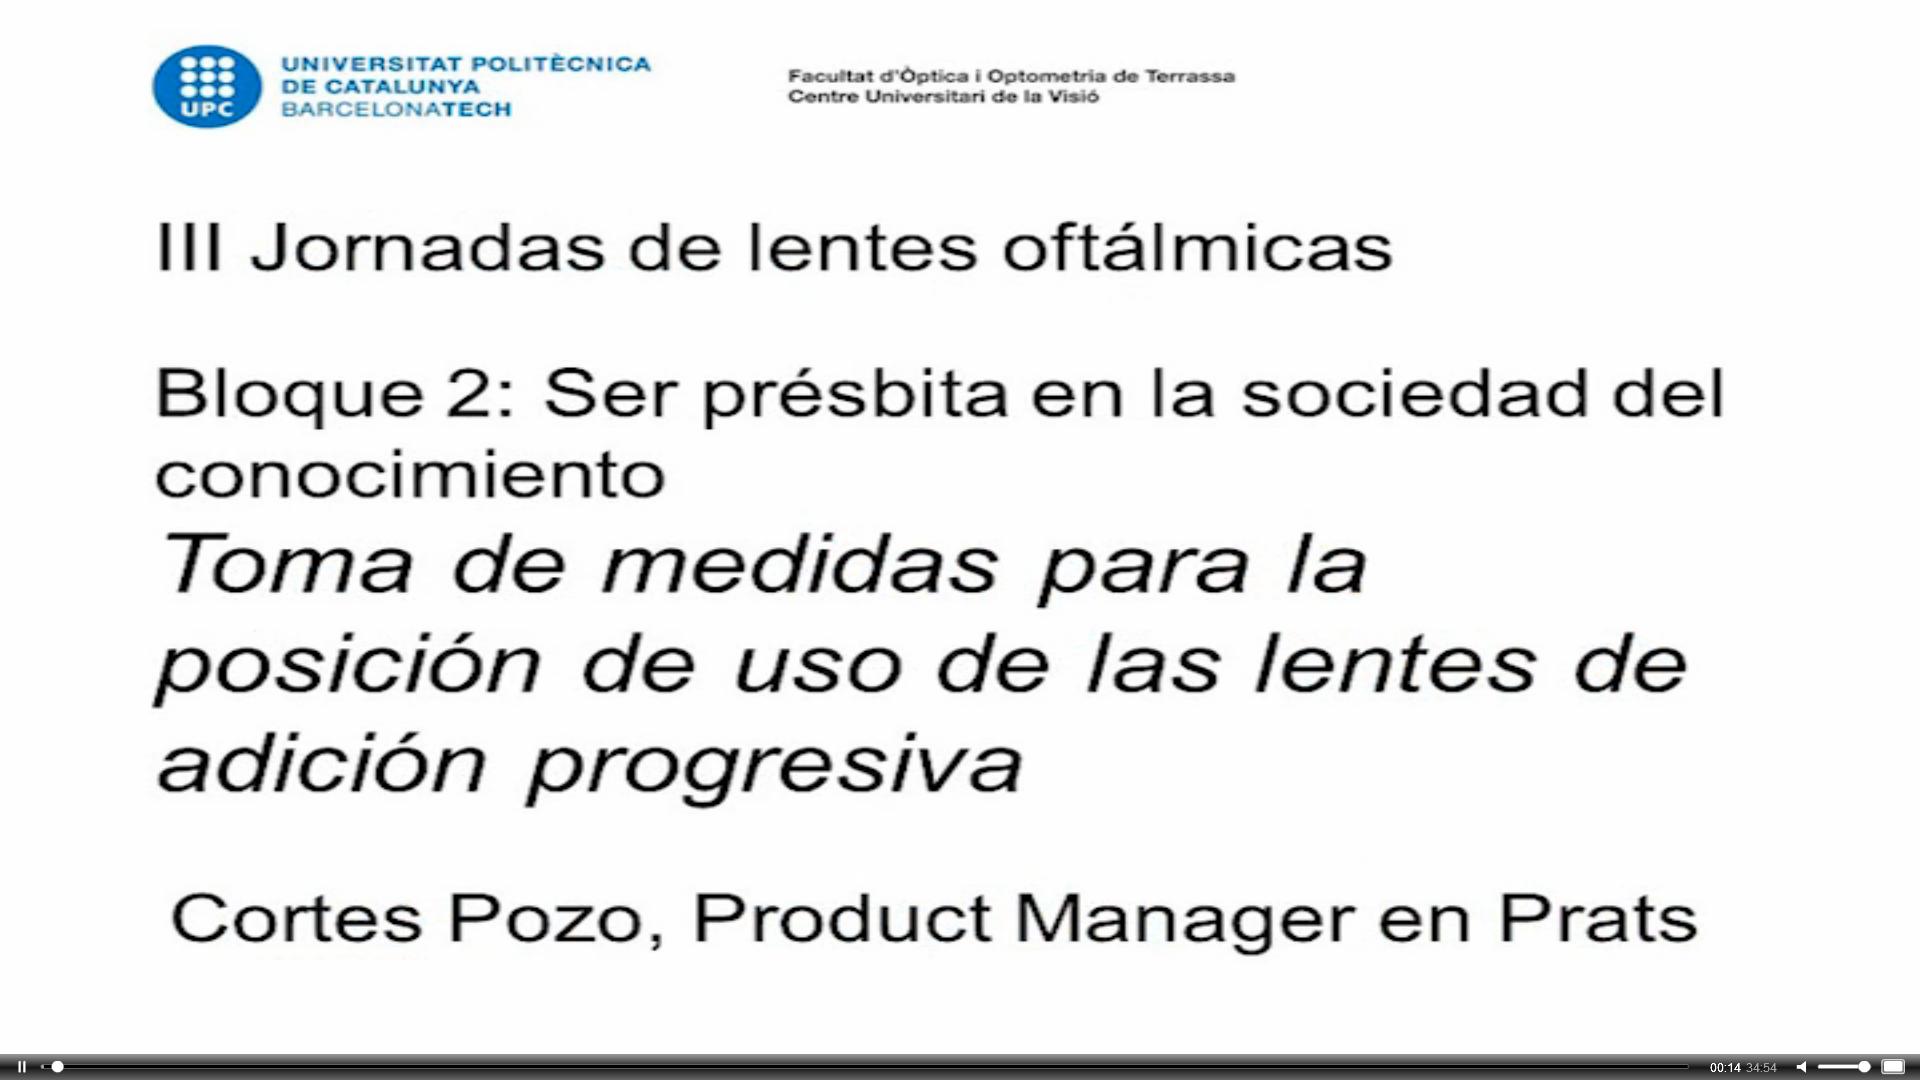 JLO2016_lentes_oftalmicas_toma_medidas_progresivas(Cortes_Pozo-Prats)